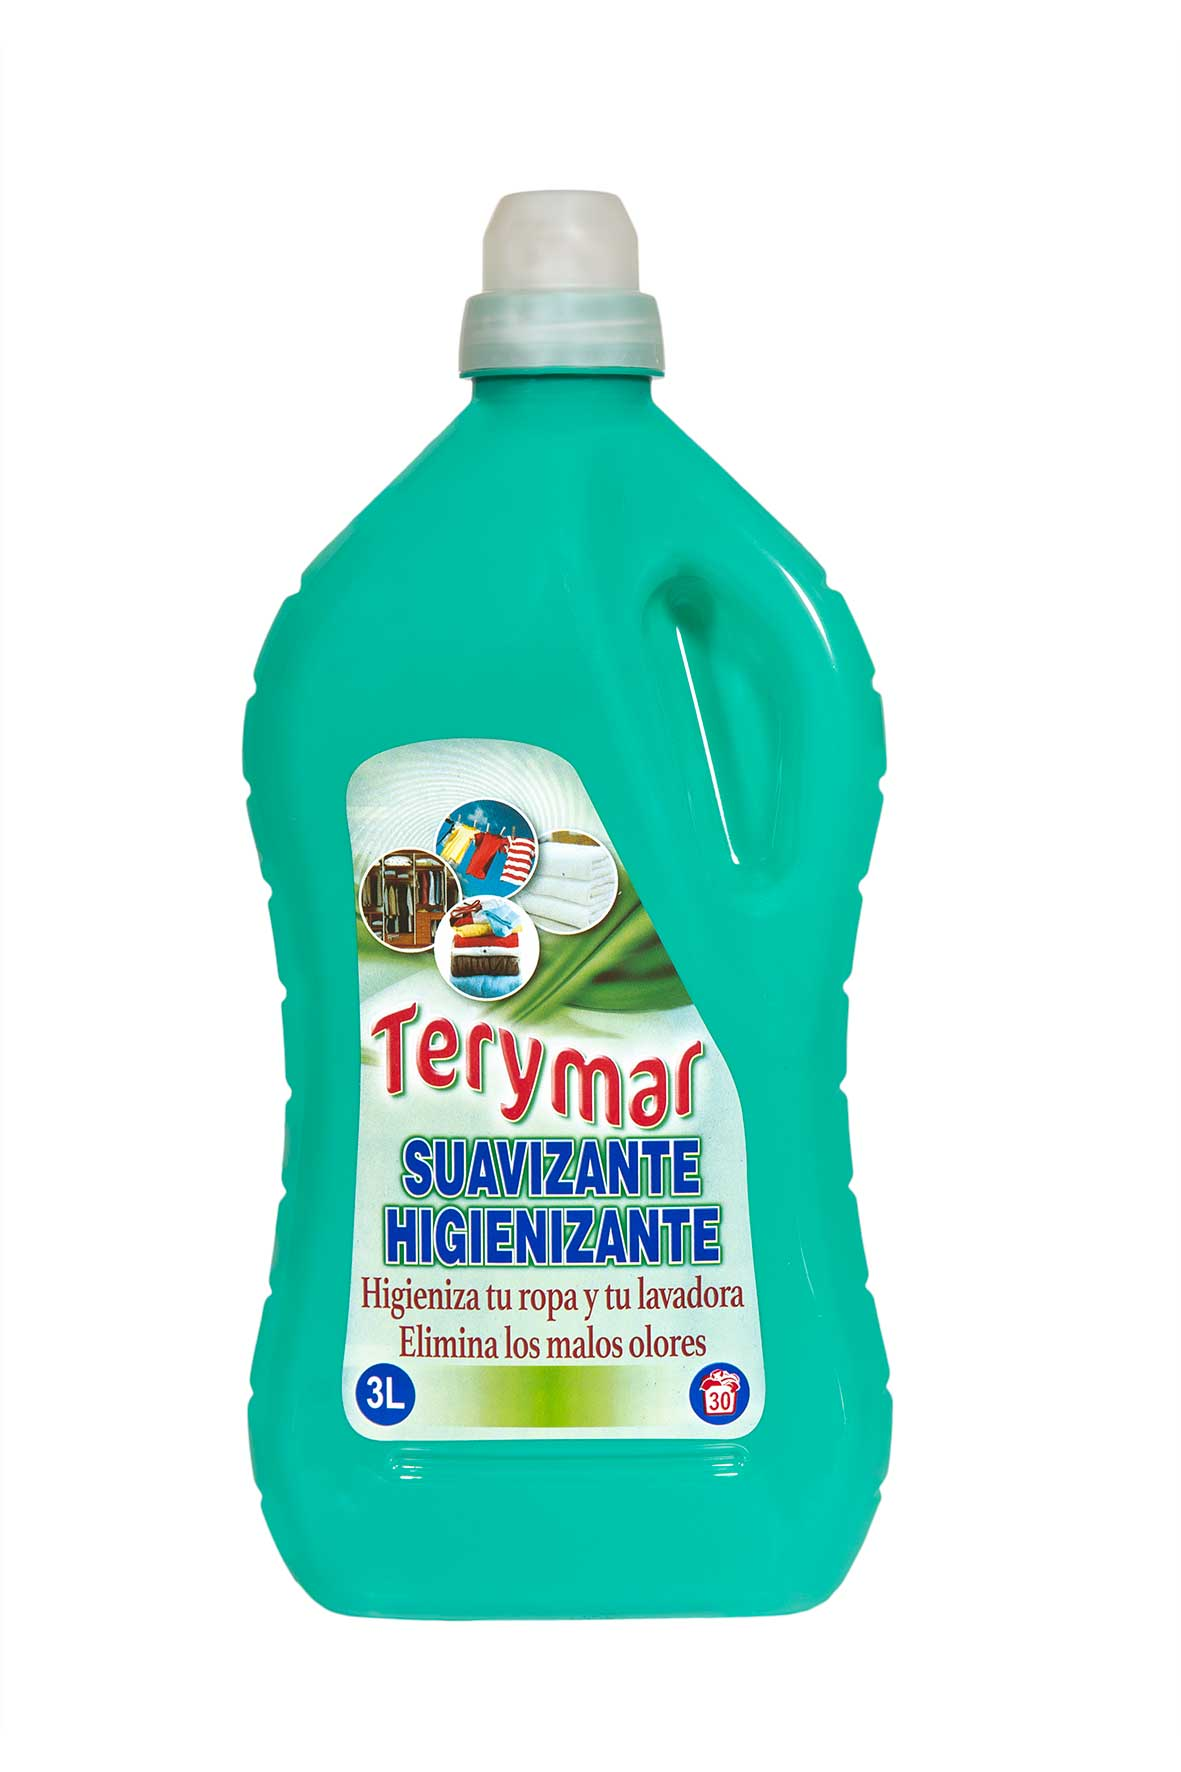 Suavizante Higienizante 3L